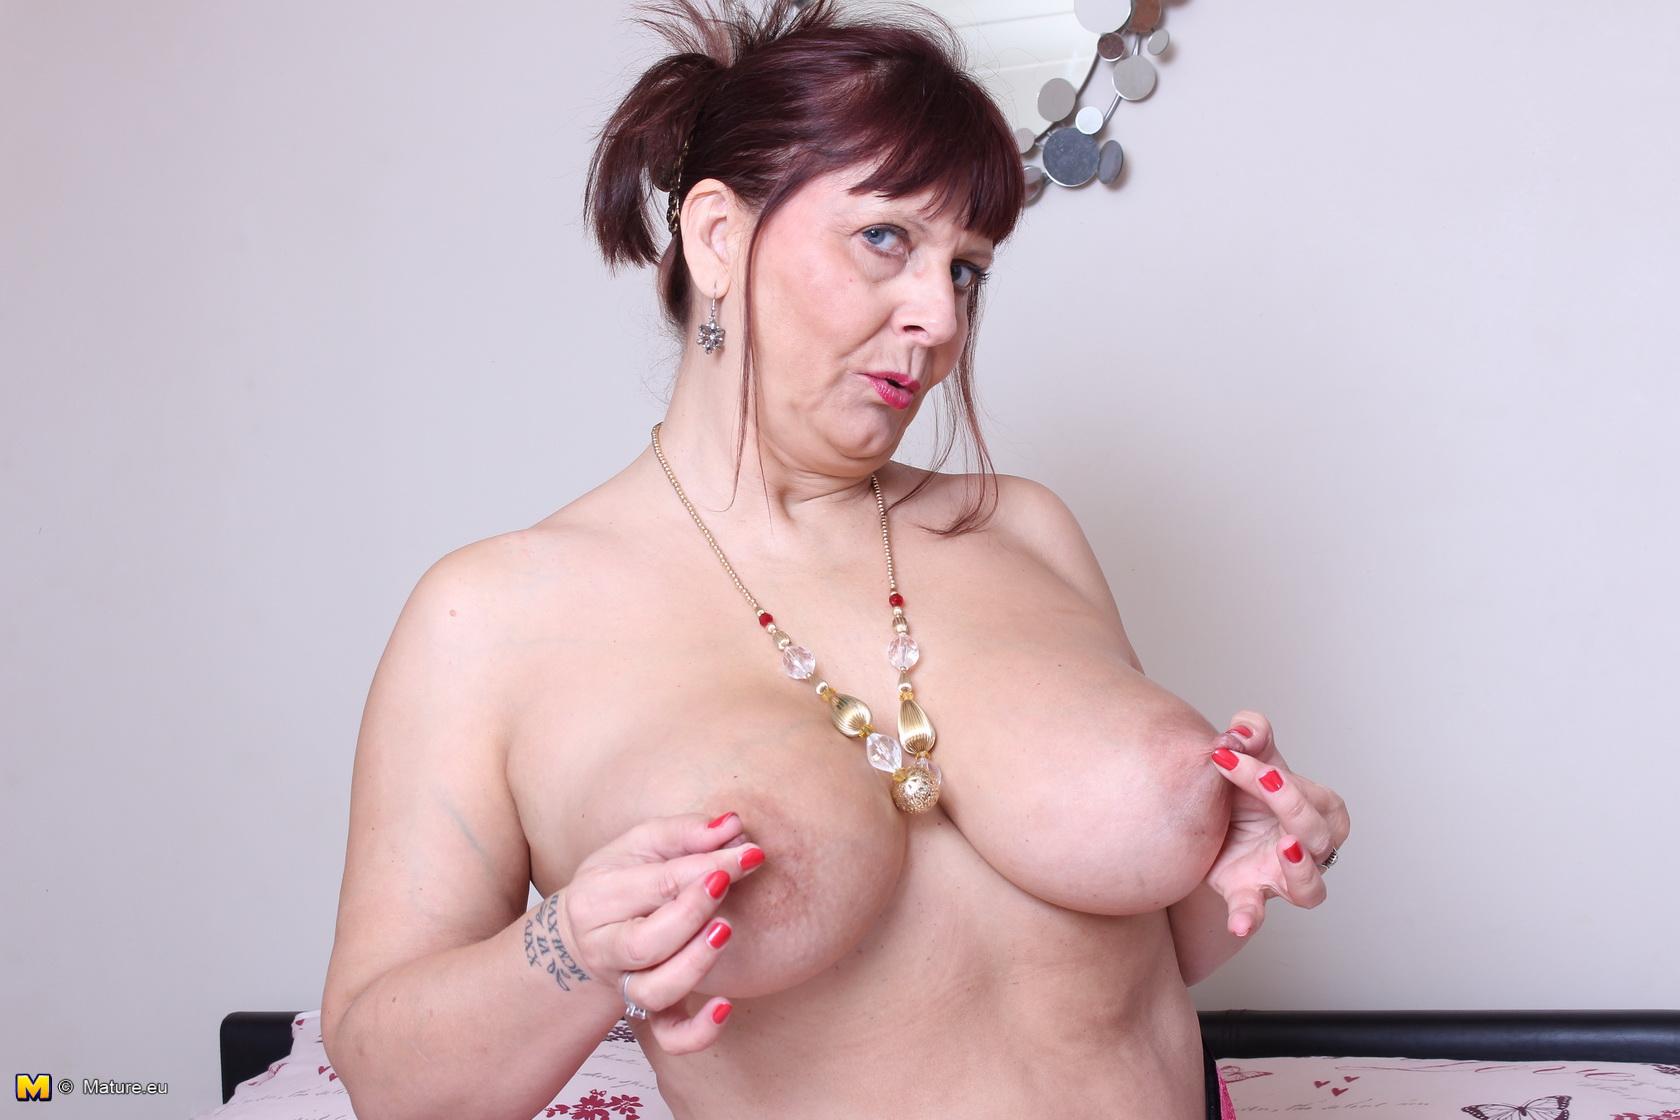 mature-english-slut-videos-pregnant-tattoos-naked